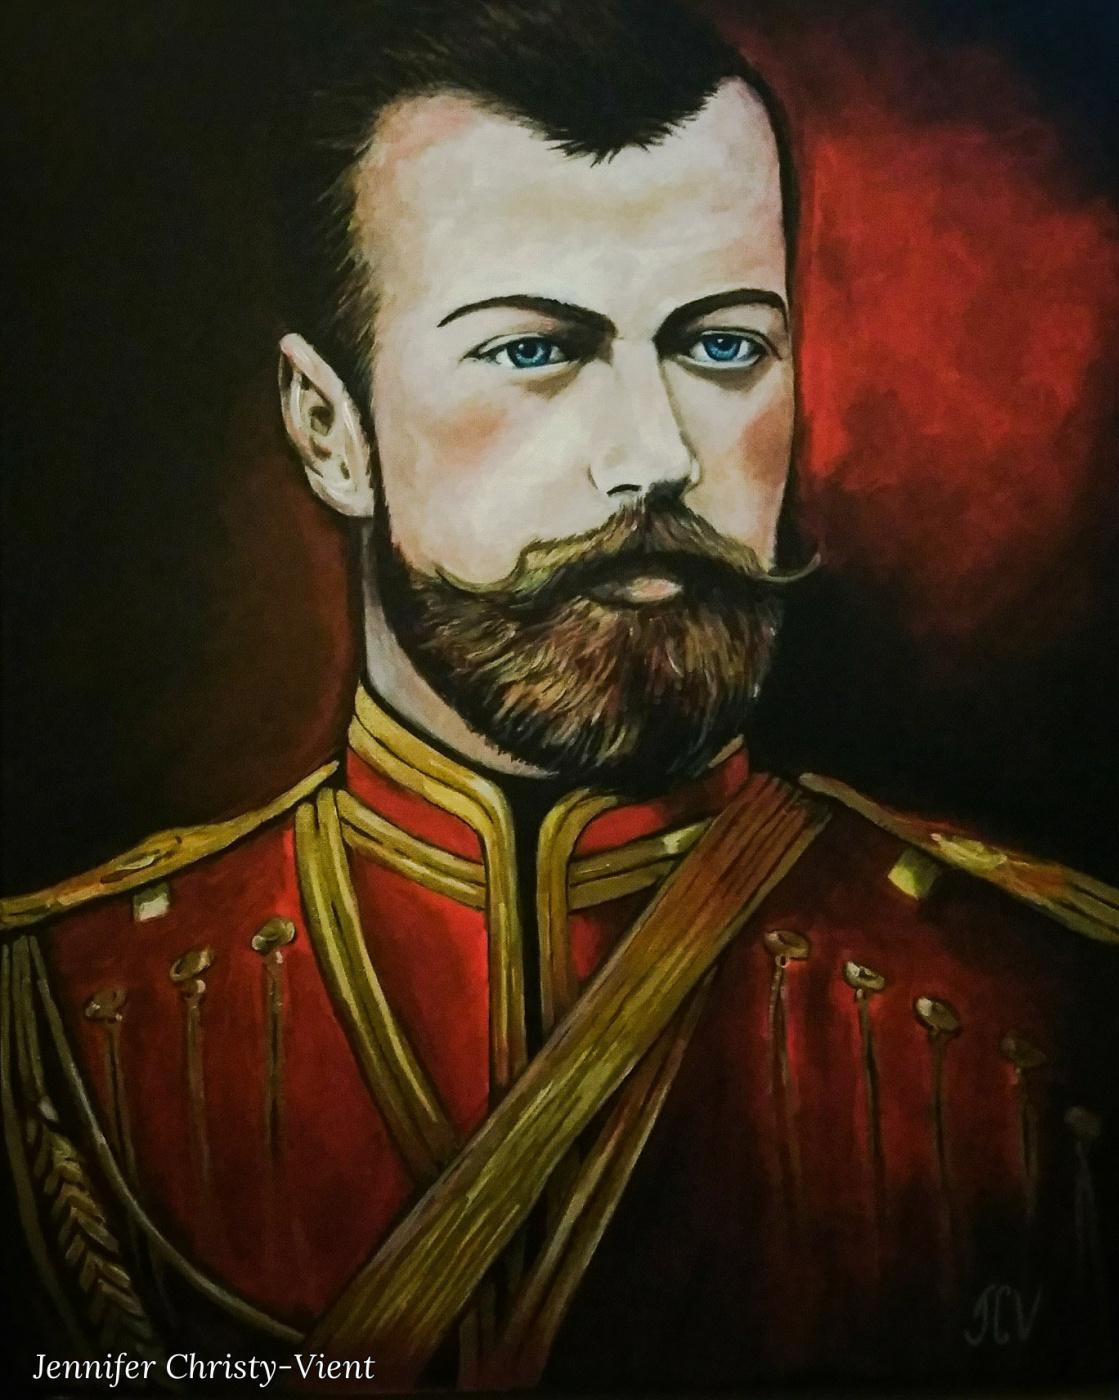 Jennifer Christy-Vient. Tsar Nikolai Romanov ll